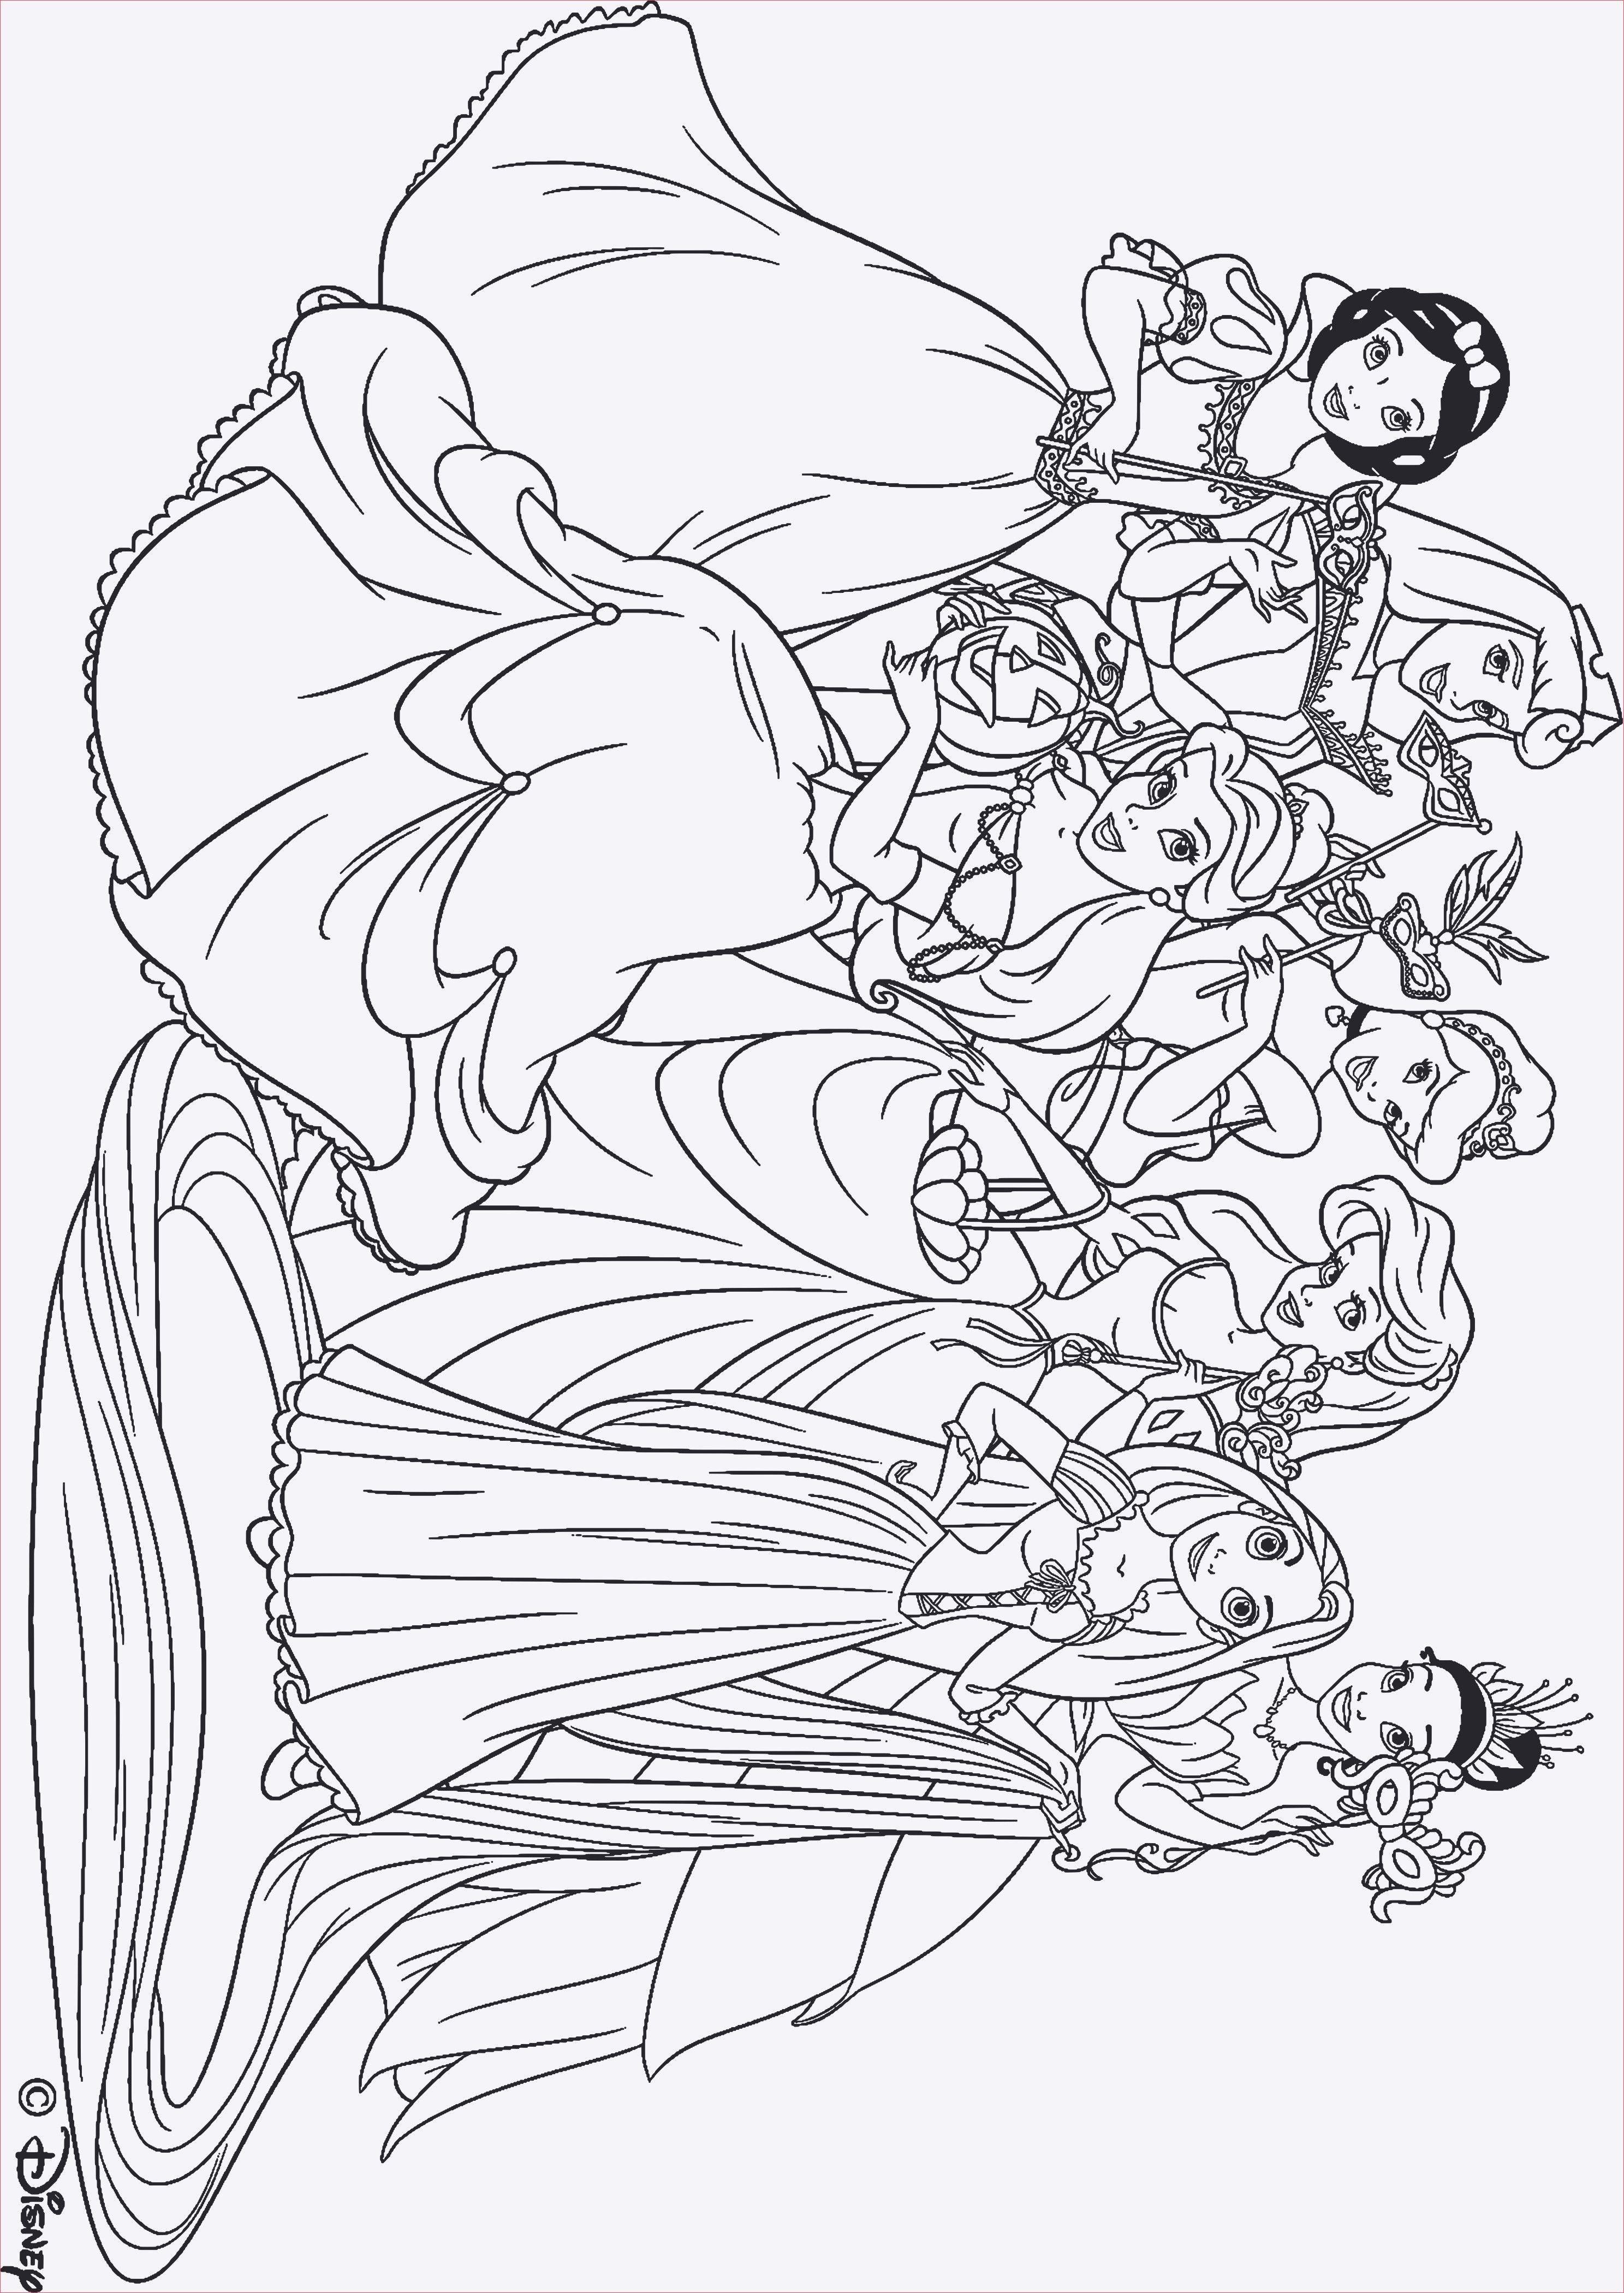 Frisch Ausmalbilder Meerjungfrau Kostenlos Malvorlagen Malvorlagenfurkinder Malvorlagenfurerwachsene Coloring Books Disney Coloring Pages Coloring Pages